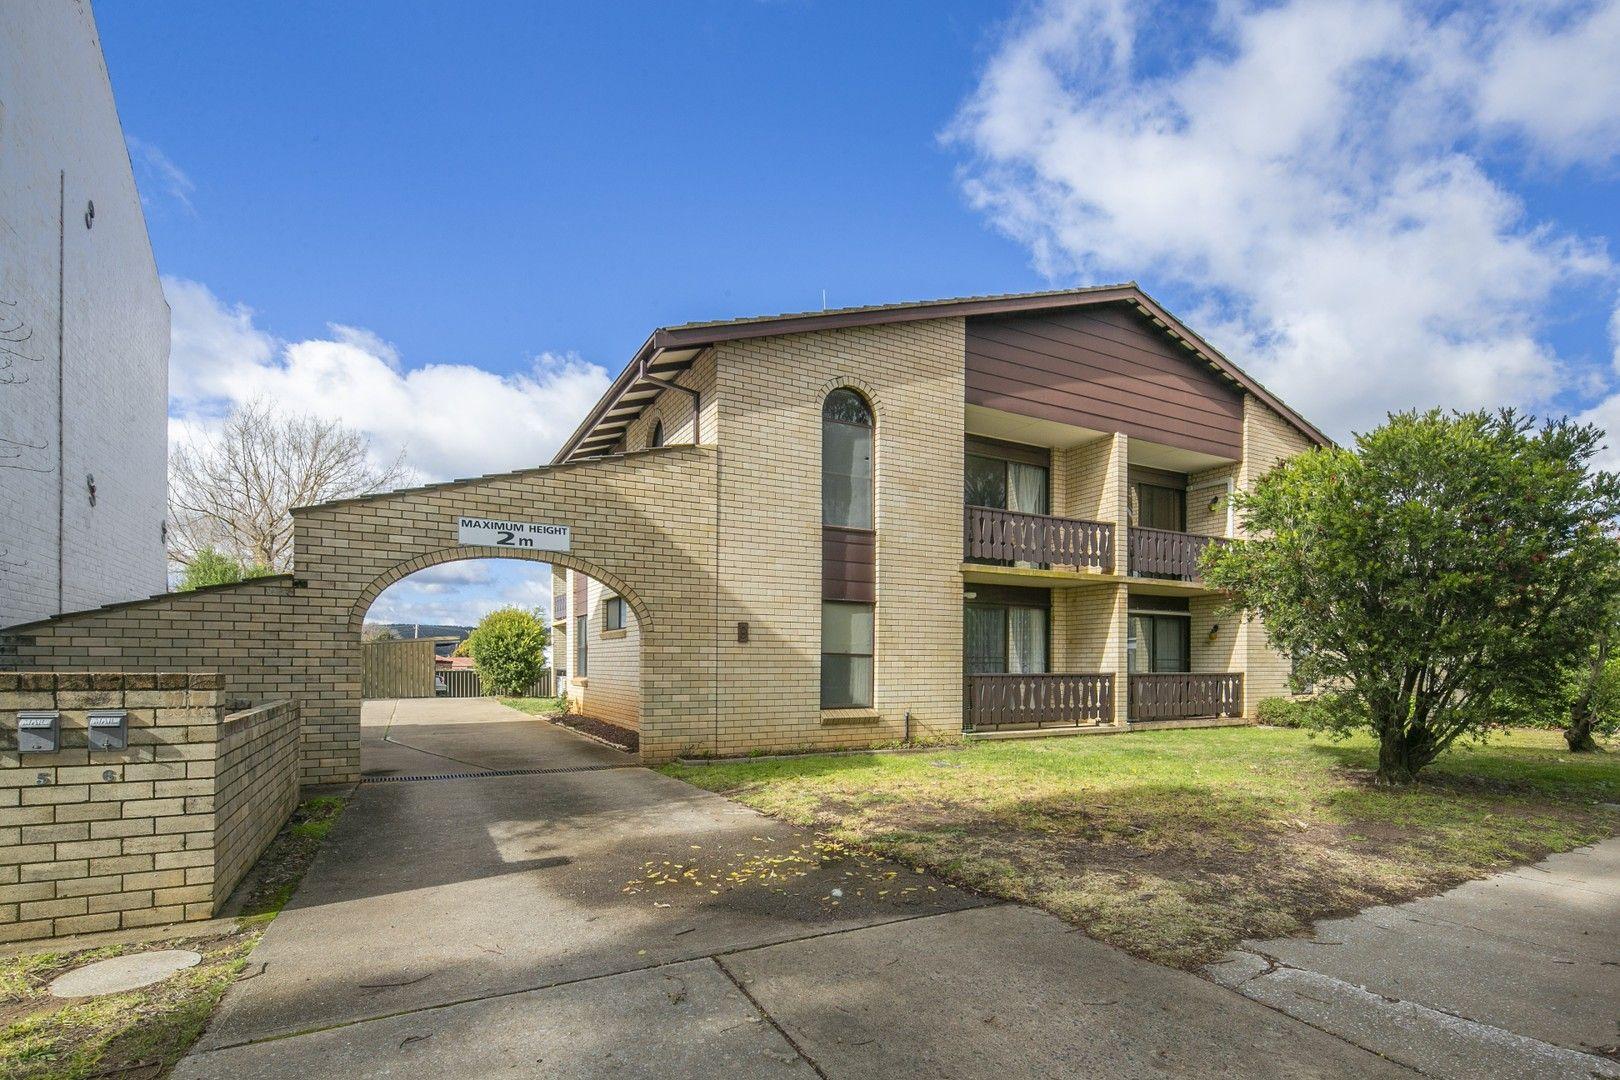 6/9 Allison  Street, Goulburn NSW 2580, Image 0